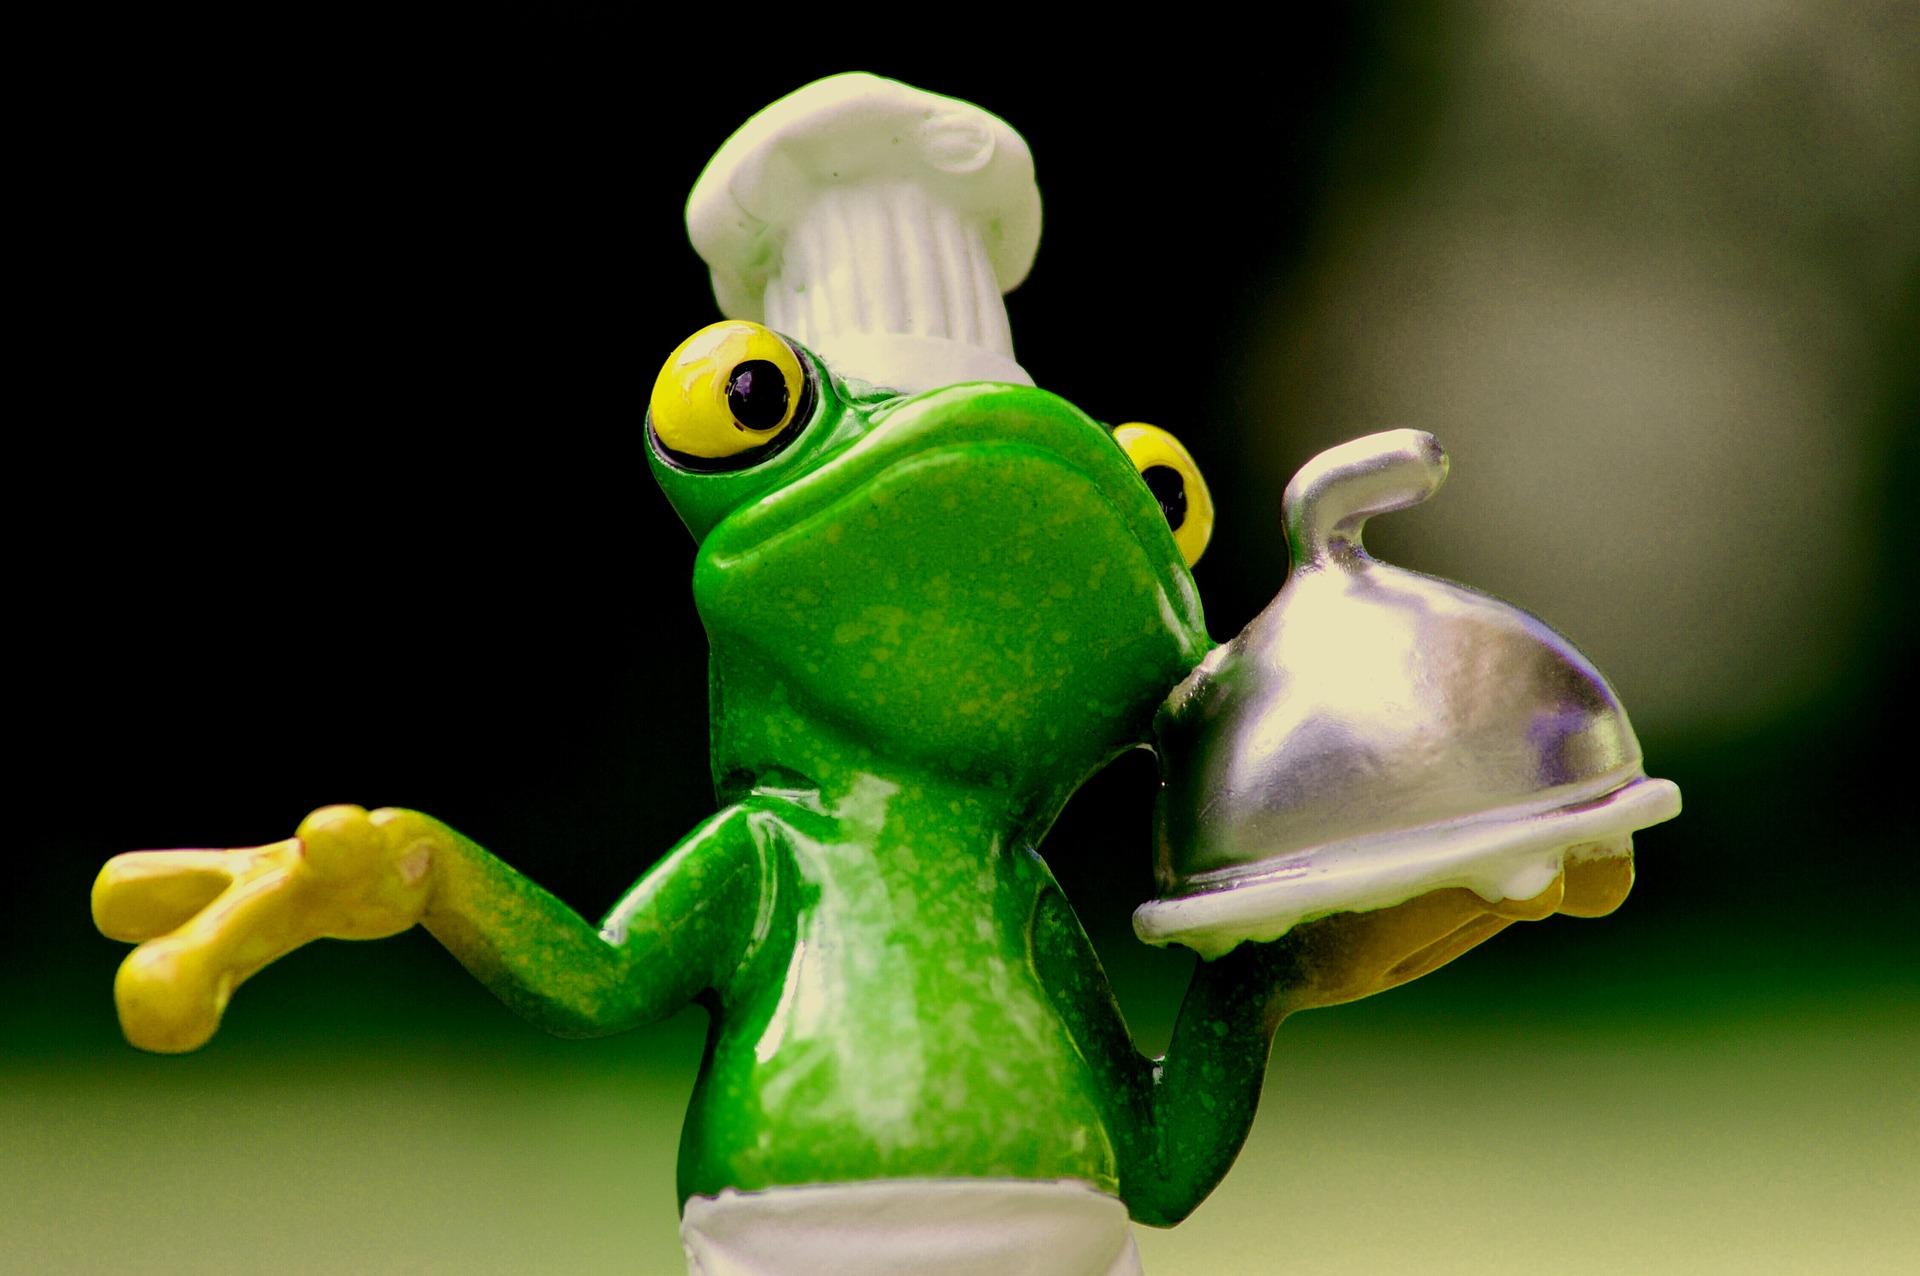 frog-1254650_1920